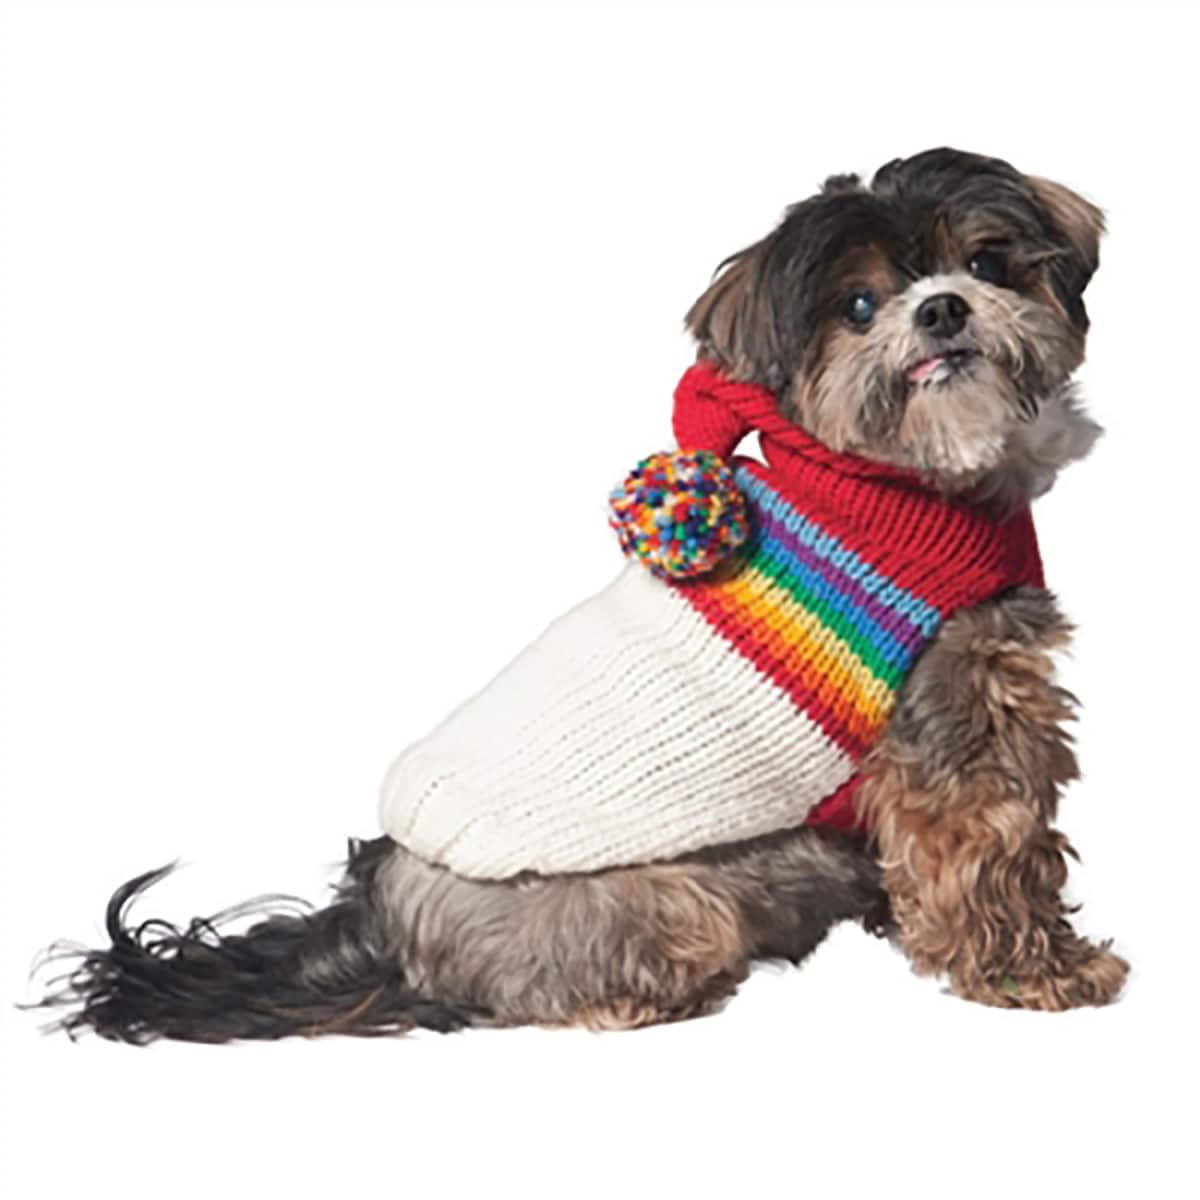 Handmade Vintage Ski Hoodie Wool Dog Sweater (X-Small)